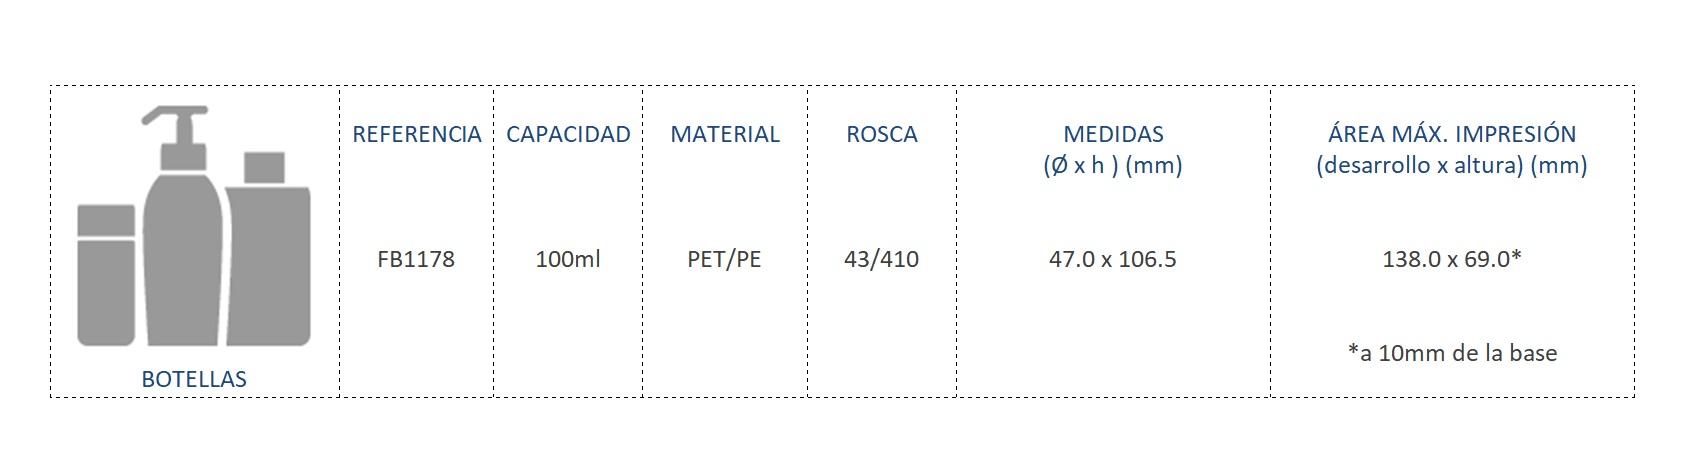 Cuadro de materiales FB1178